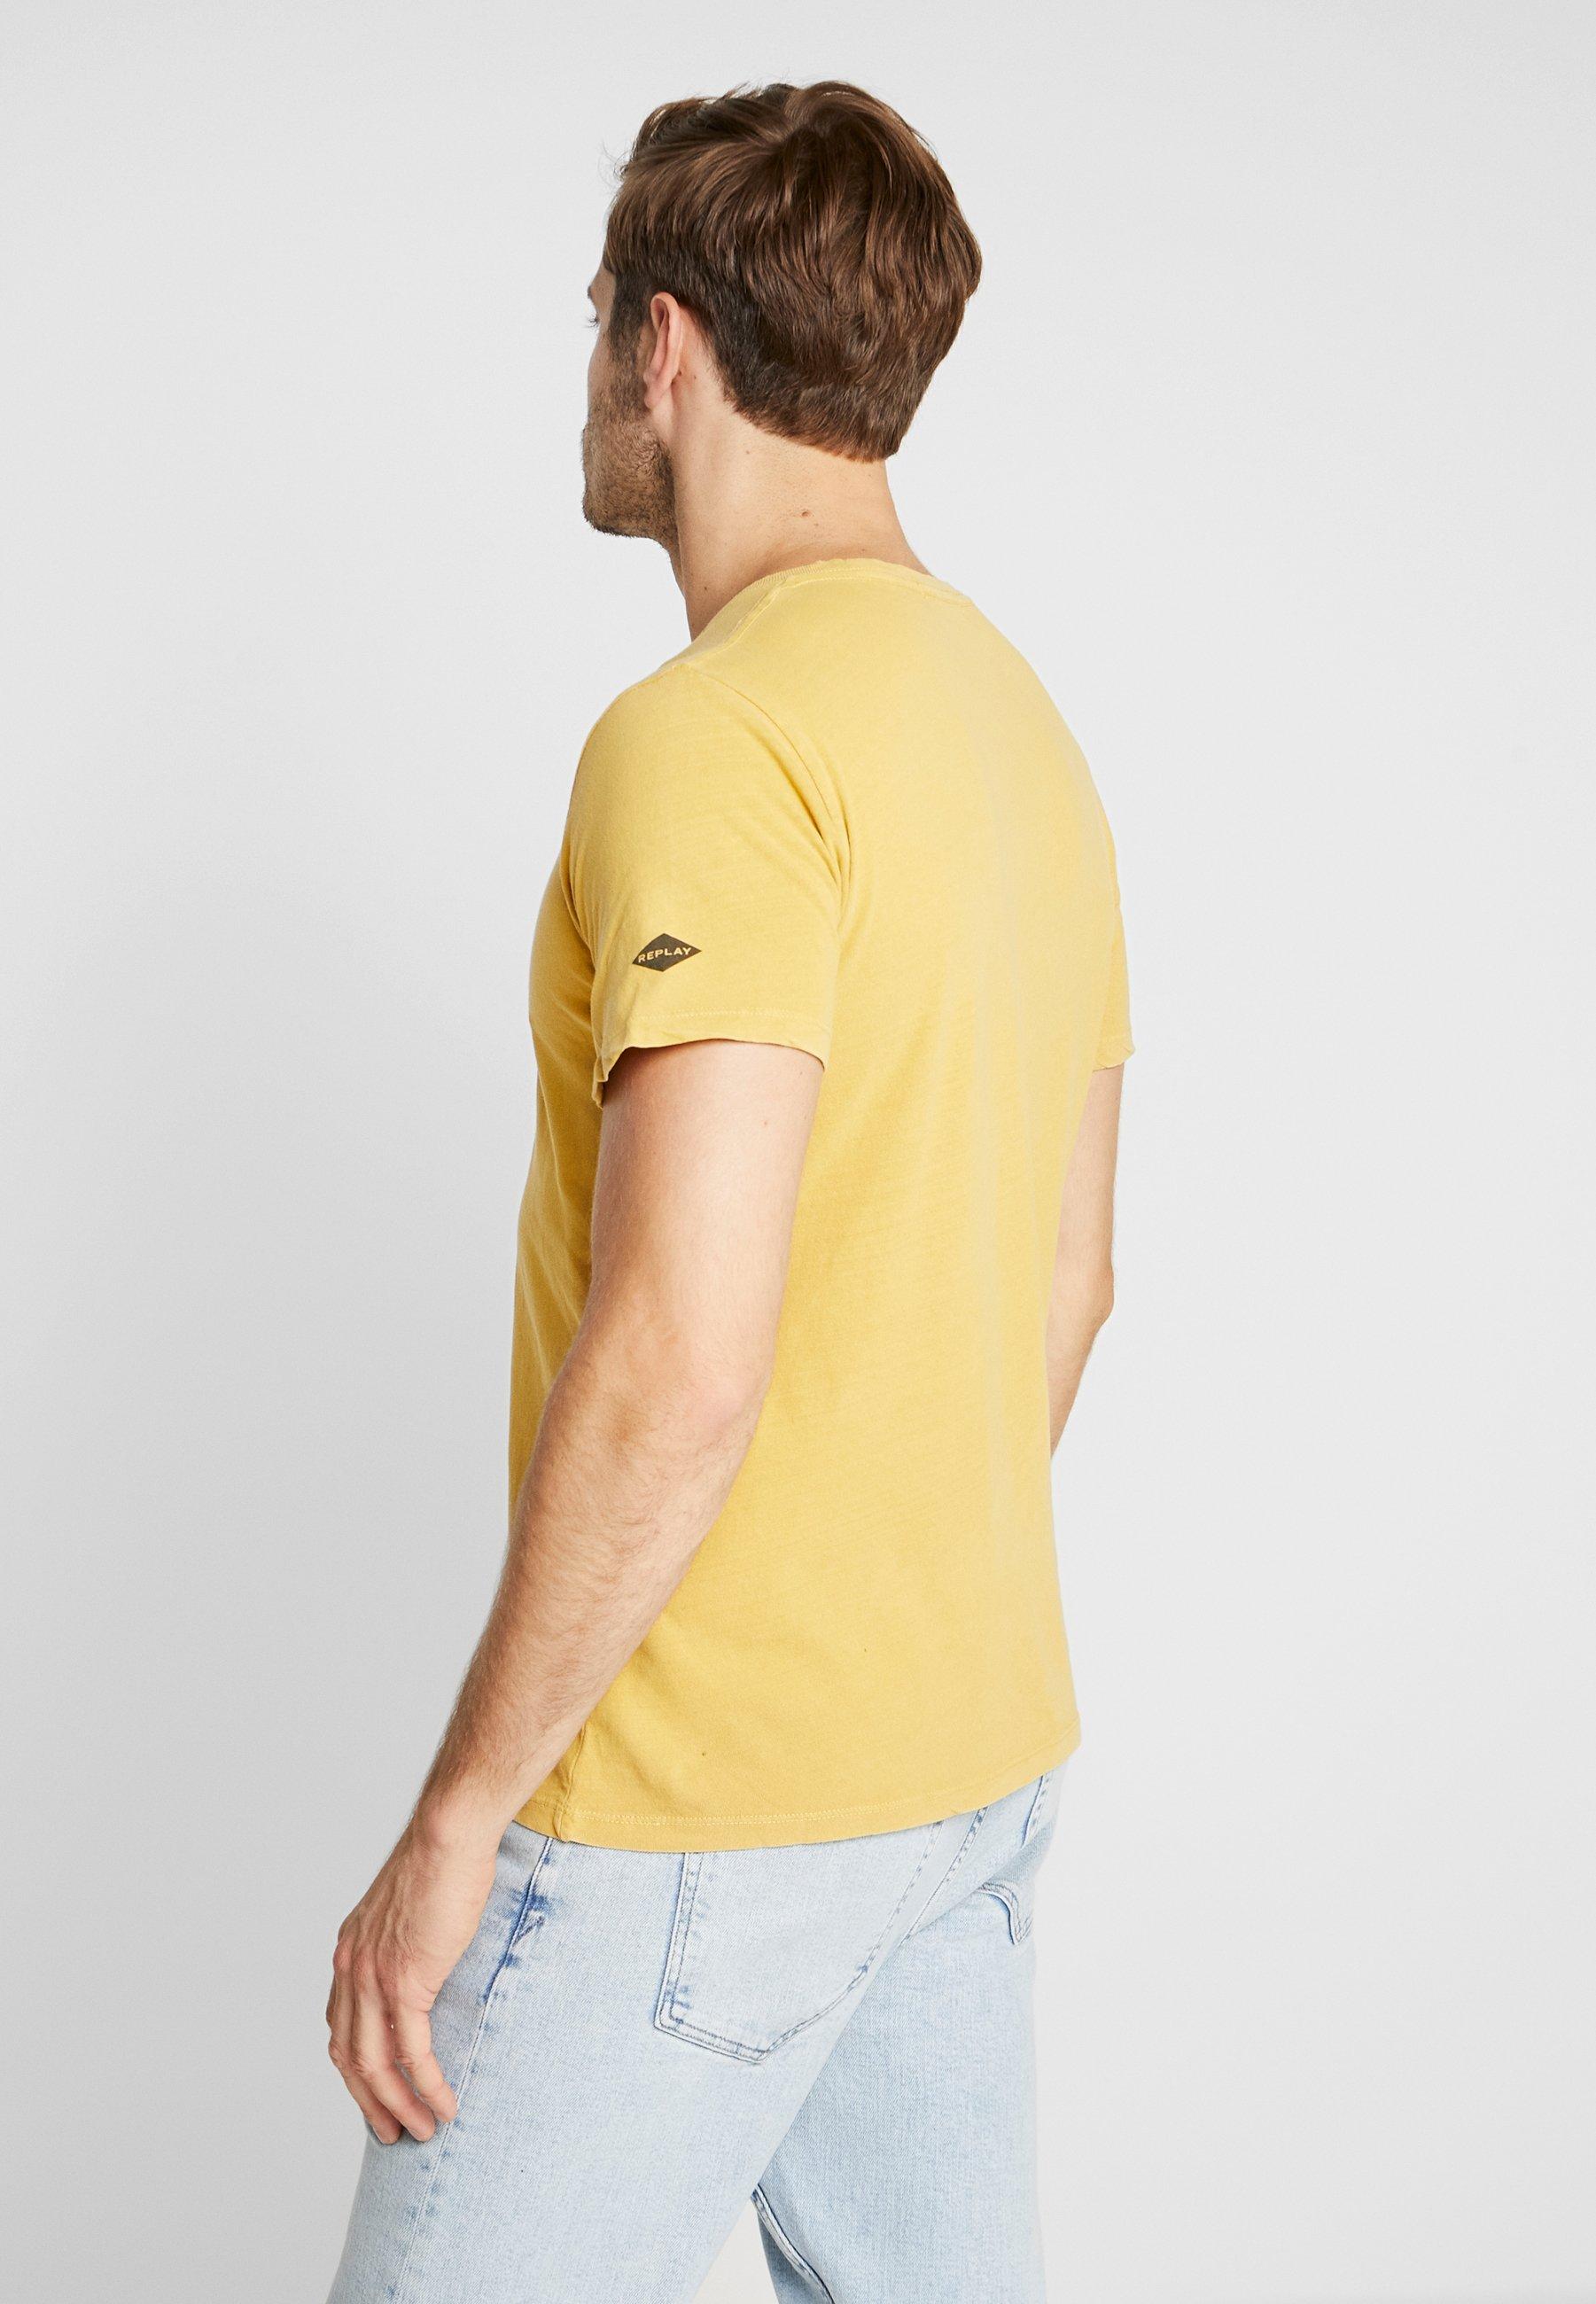 Yellow shirt Replay Basic Vintage T QxoECBedrW